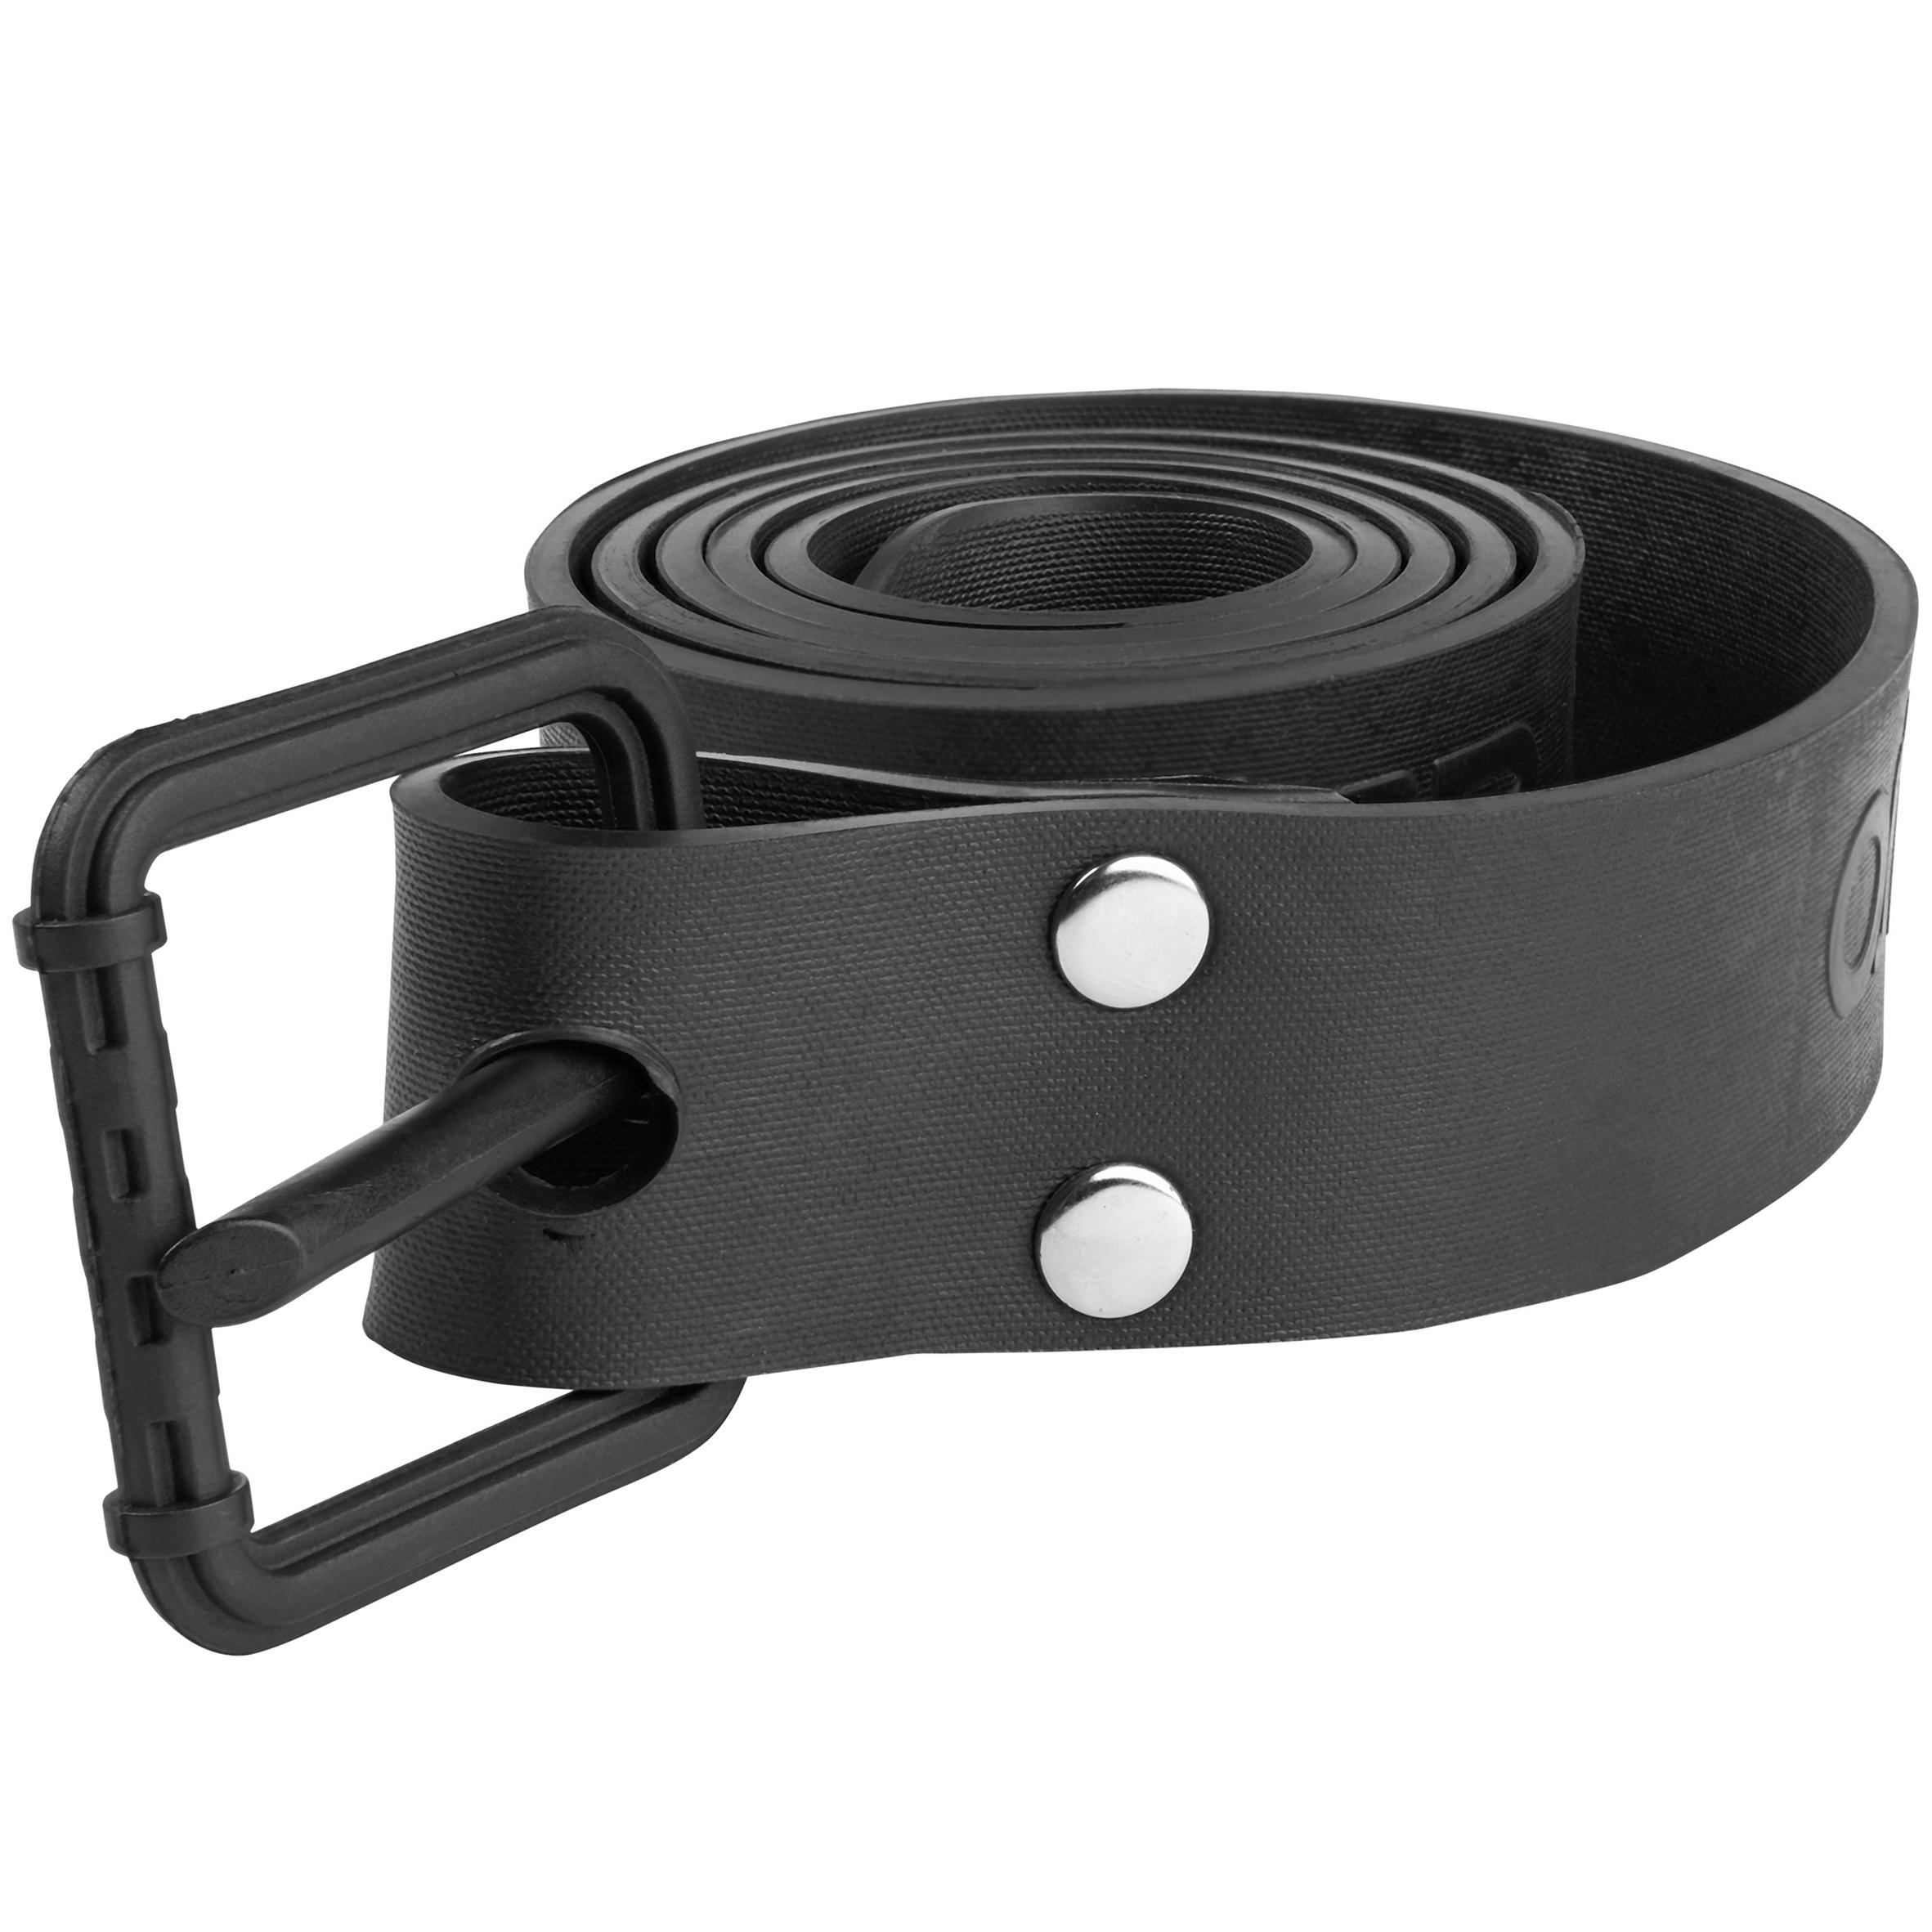 Black Omer Rubber Weight Belt w// Nylon Buckle